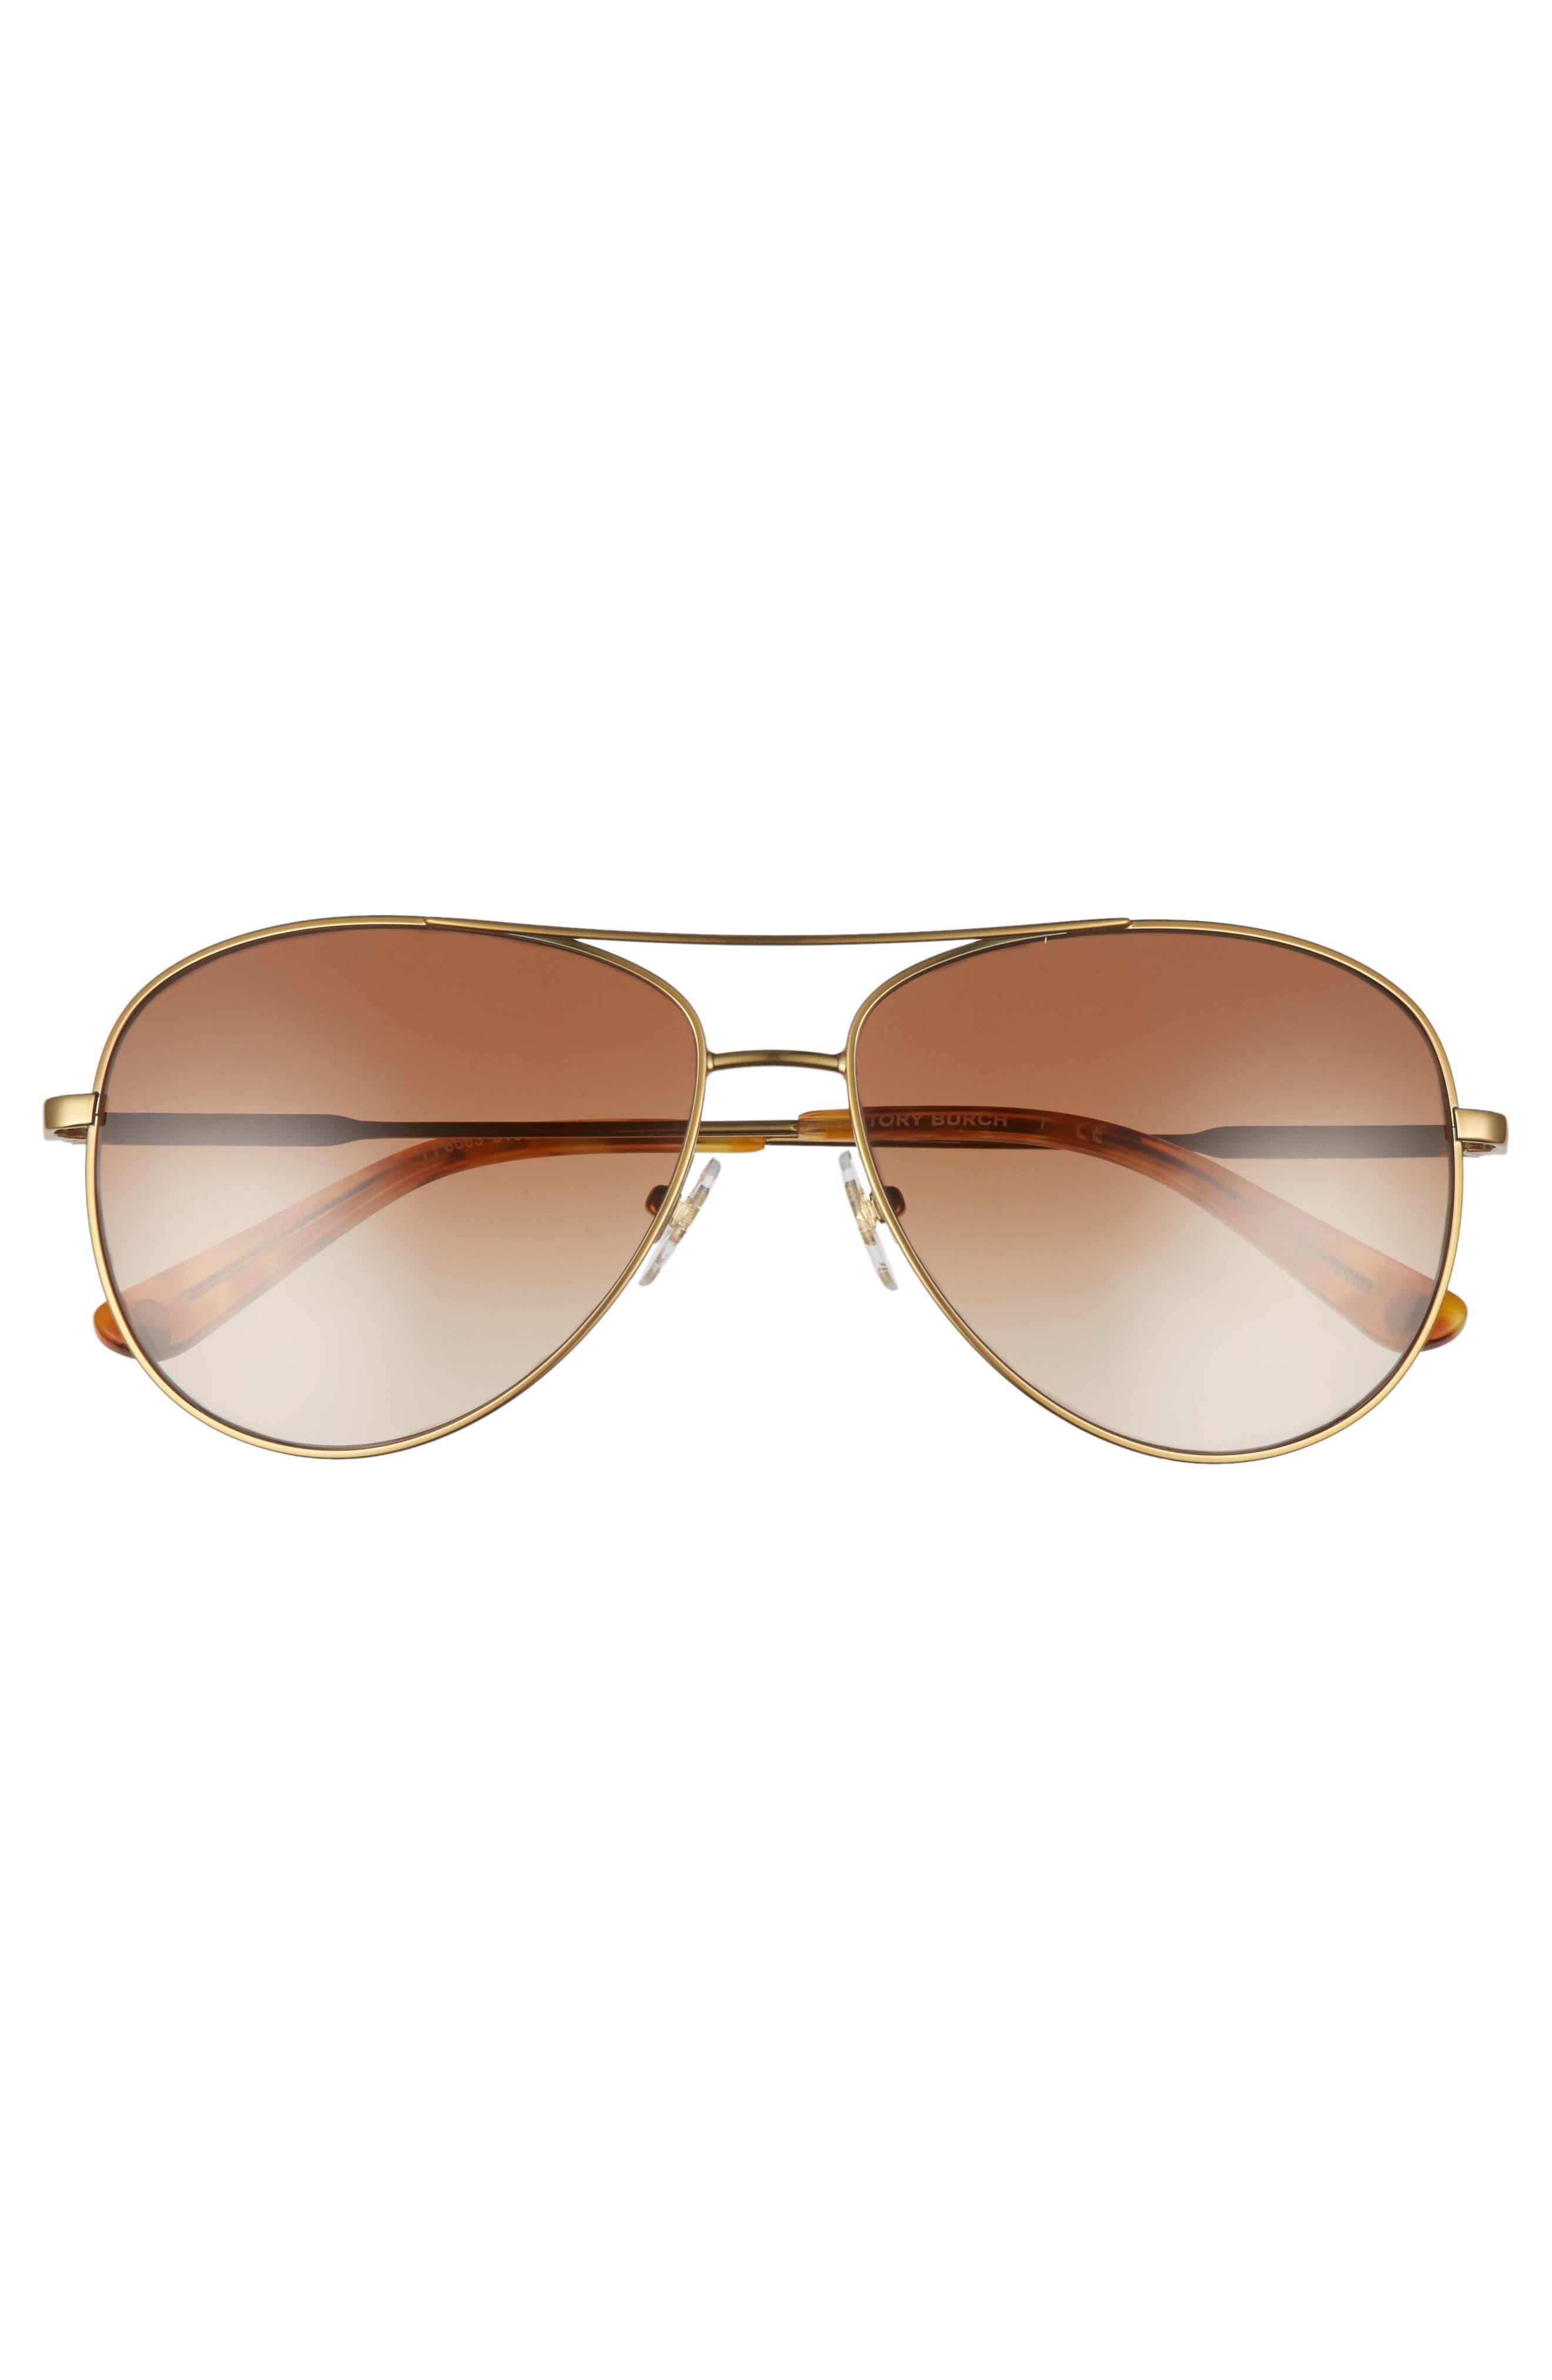 59mm Metal Aviator Sunglasses,                             Alternate thumbnail 4, color,                             GOLD